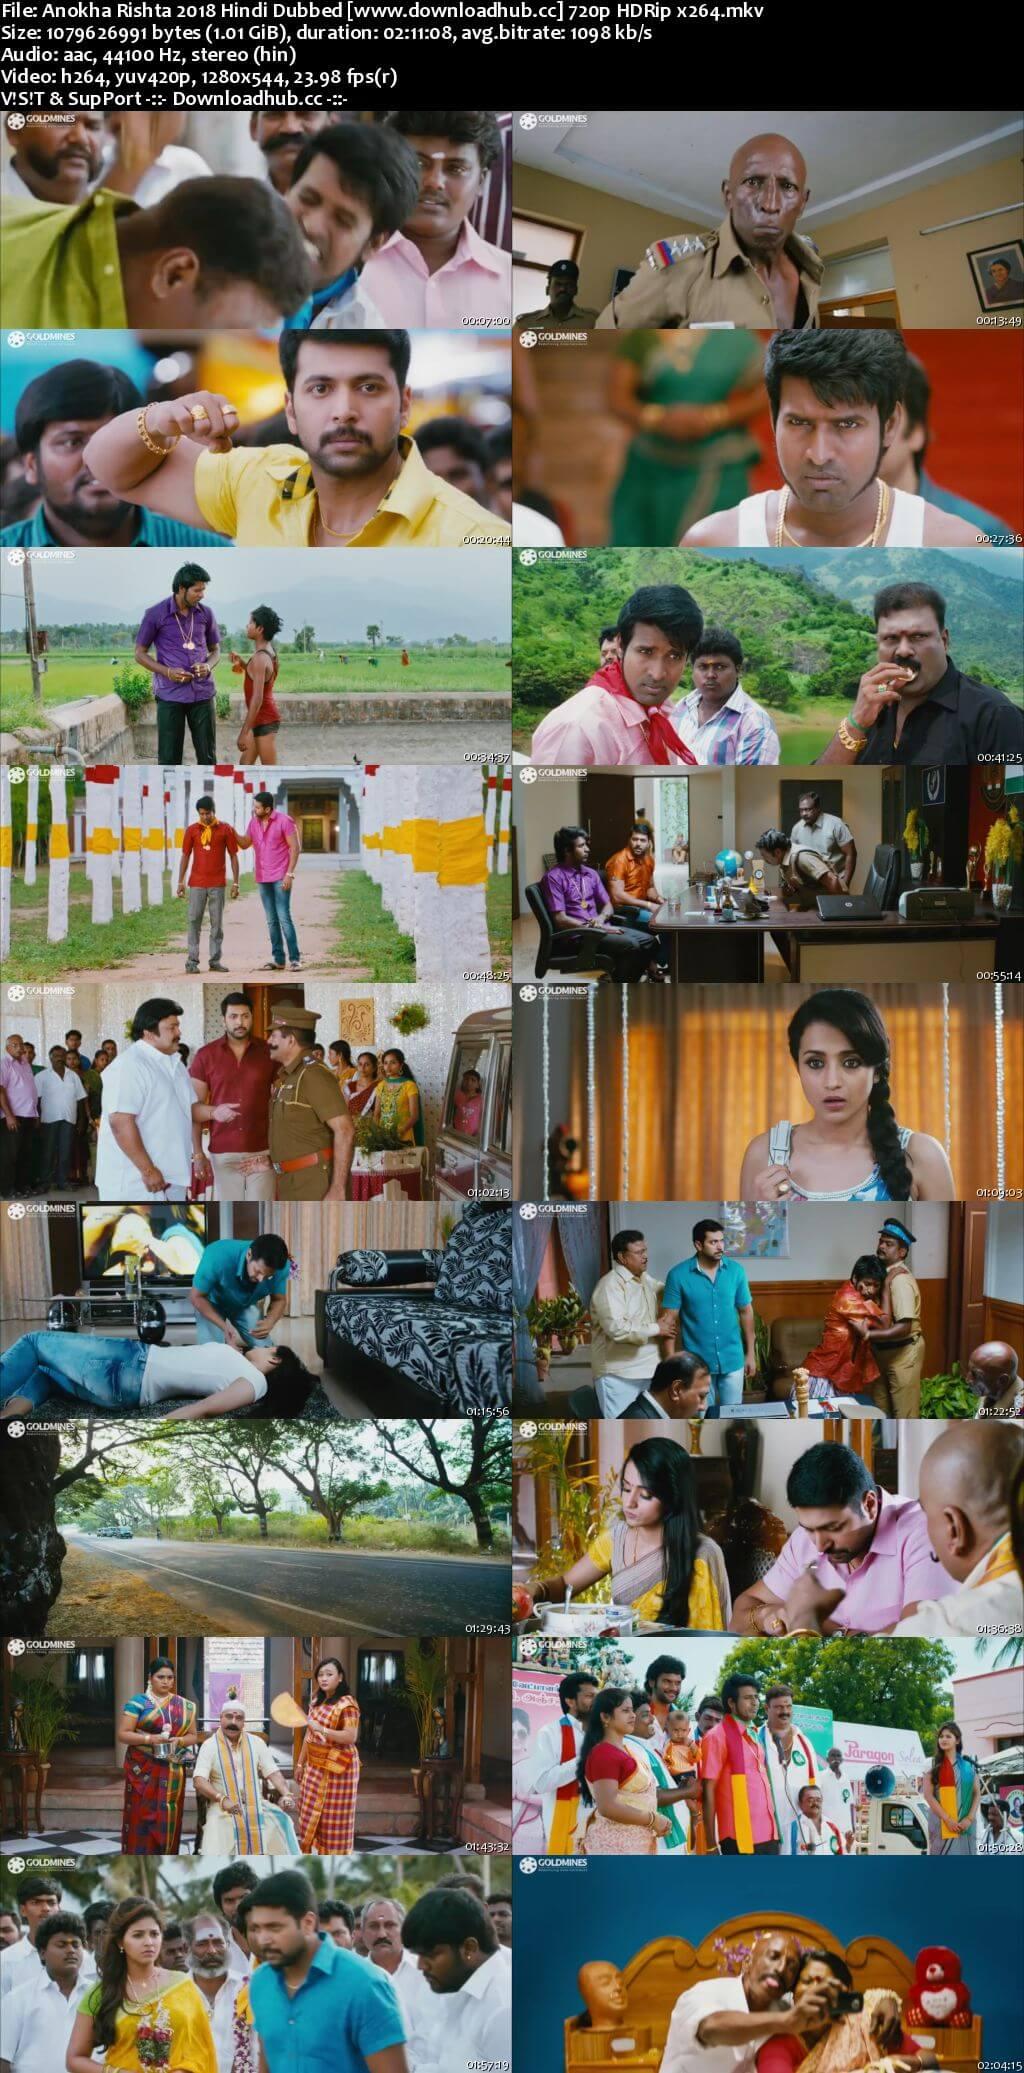 Anokha Rishta 2018 Hindi Dubbed 720p HDRip x264